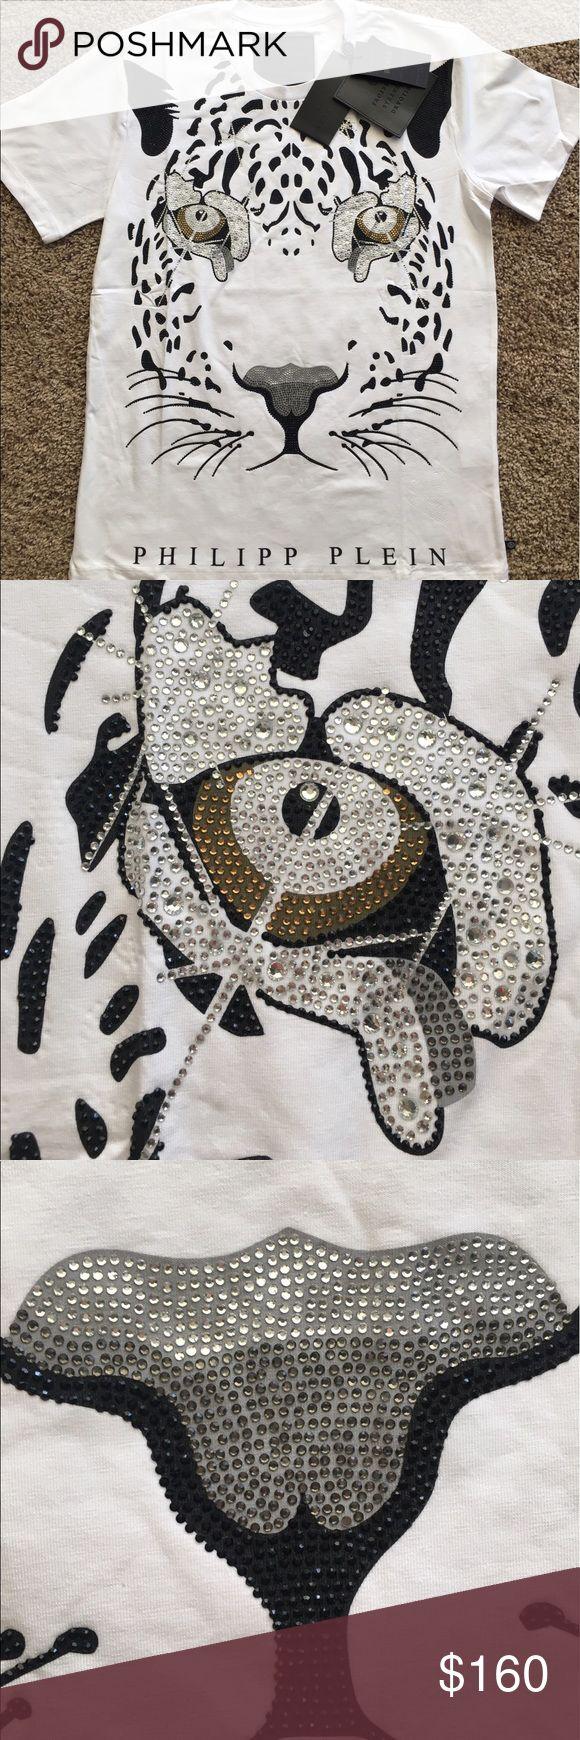 Philipp Plein Men t Shirt Tiger Embellished With Rhinestones on front and metal logo on back. Philipp Plein Shirts Tees - Short Sleeve